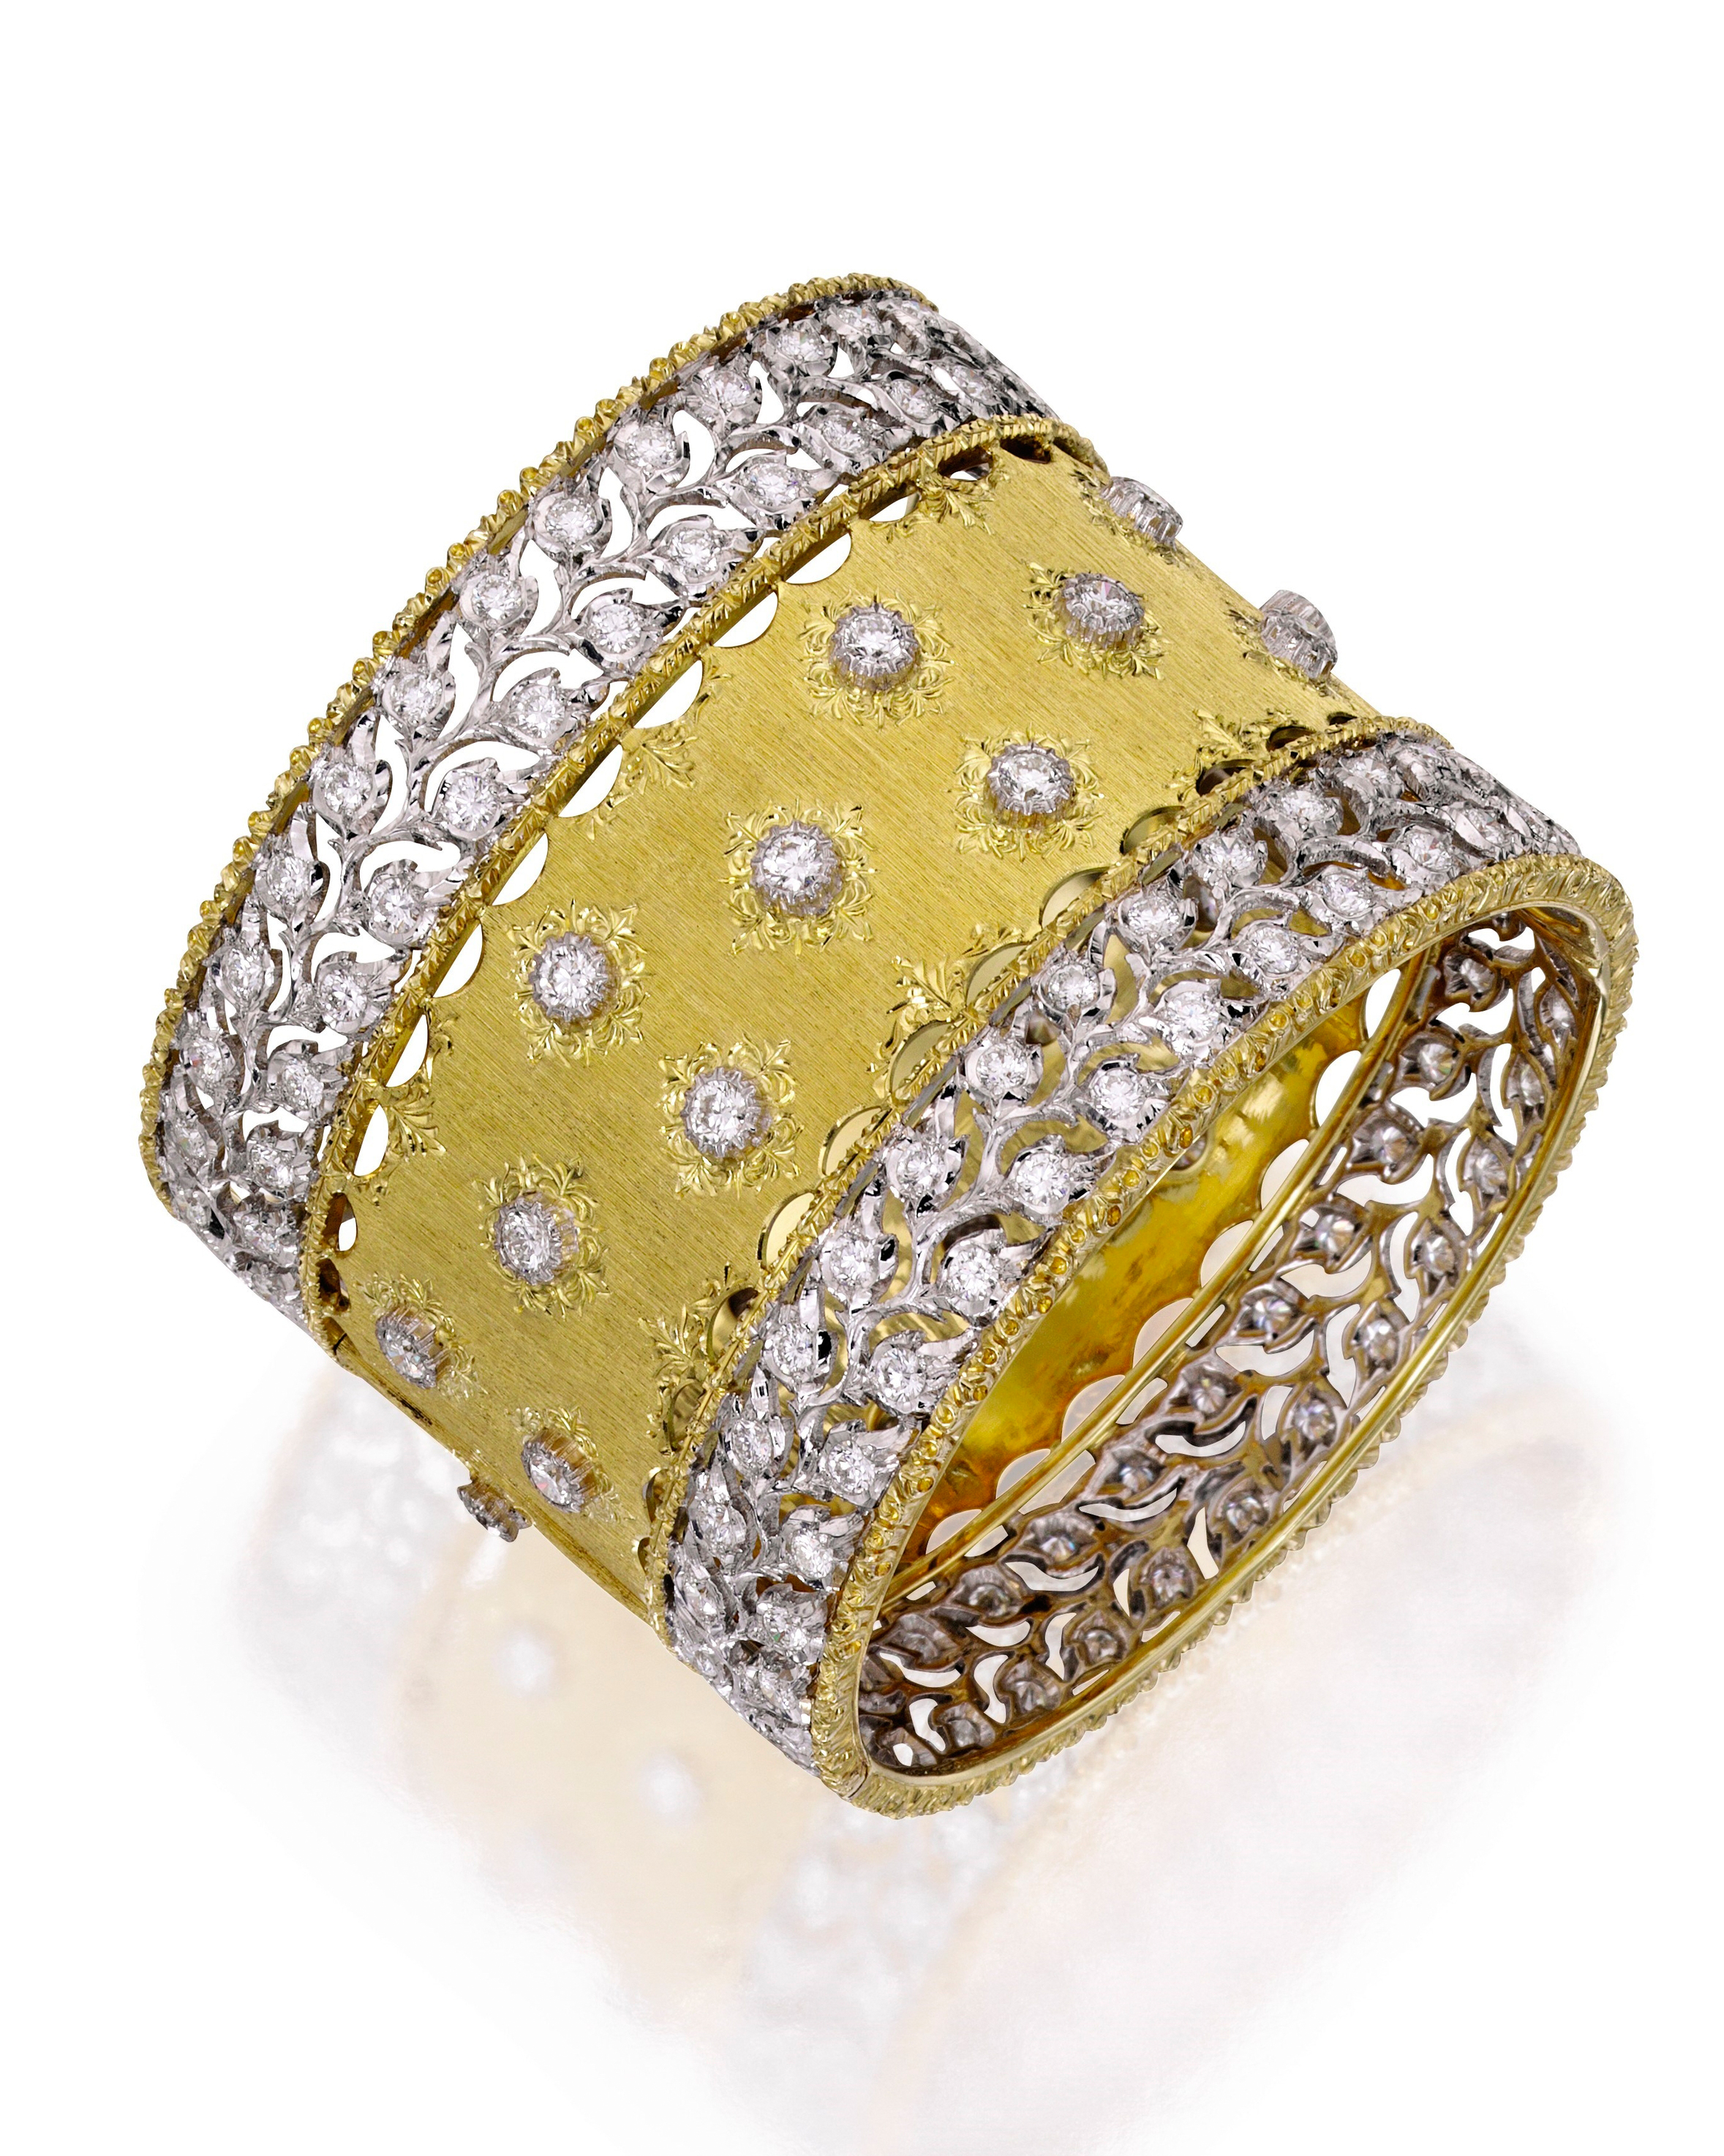 sothebys-ebay-auction-9331-lot-138-0415.jpg